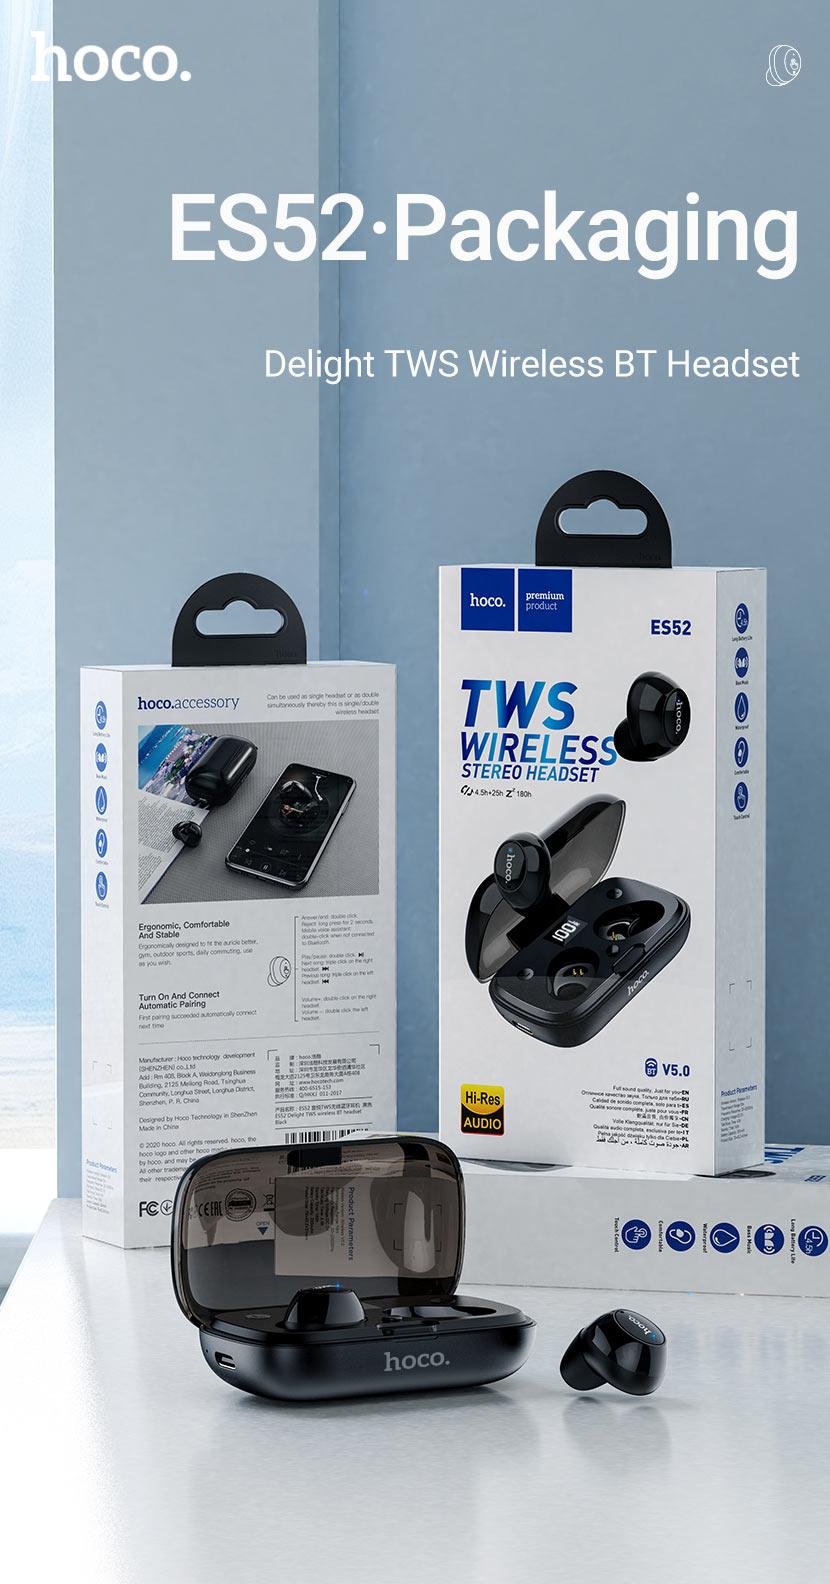 hoco news es52 delight tws wireless bt headset package en